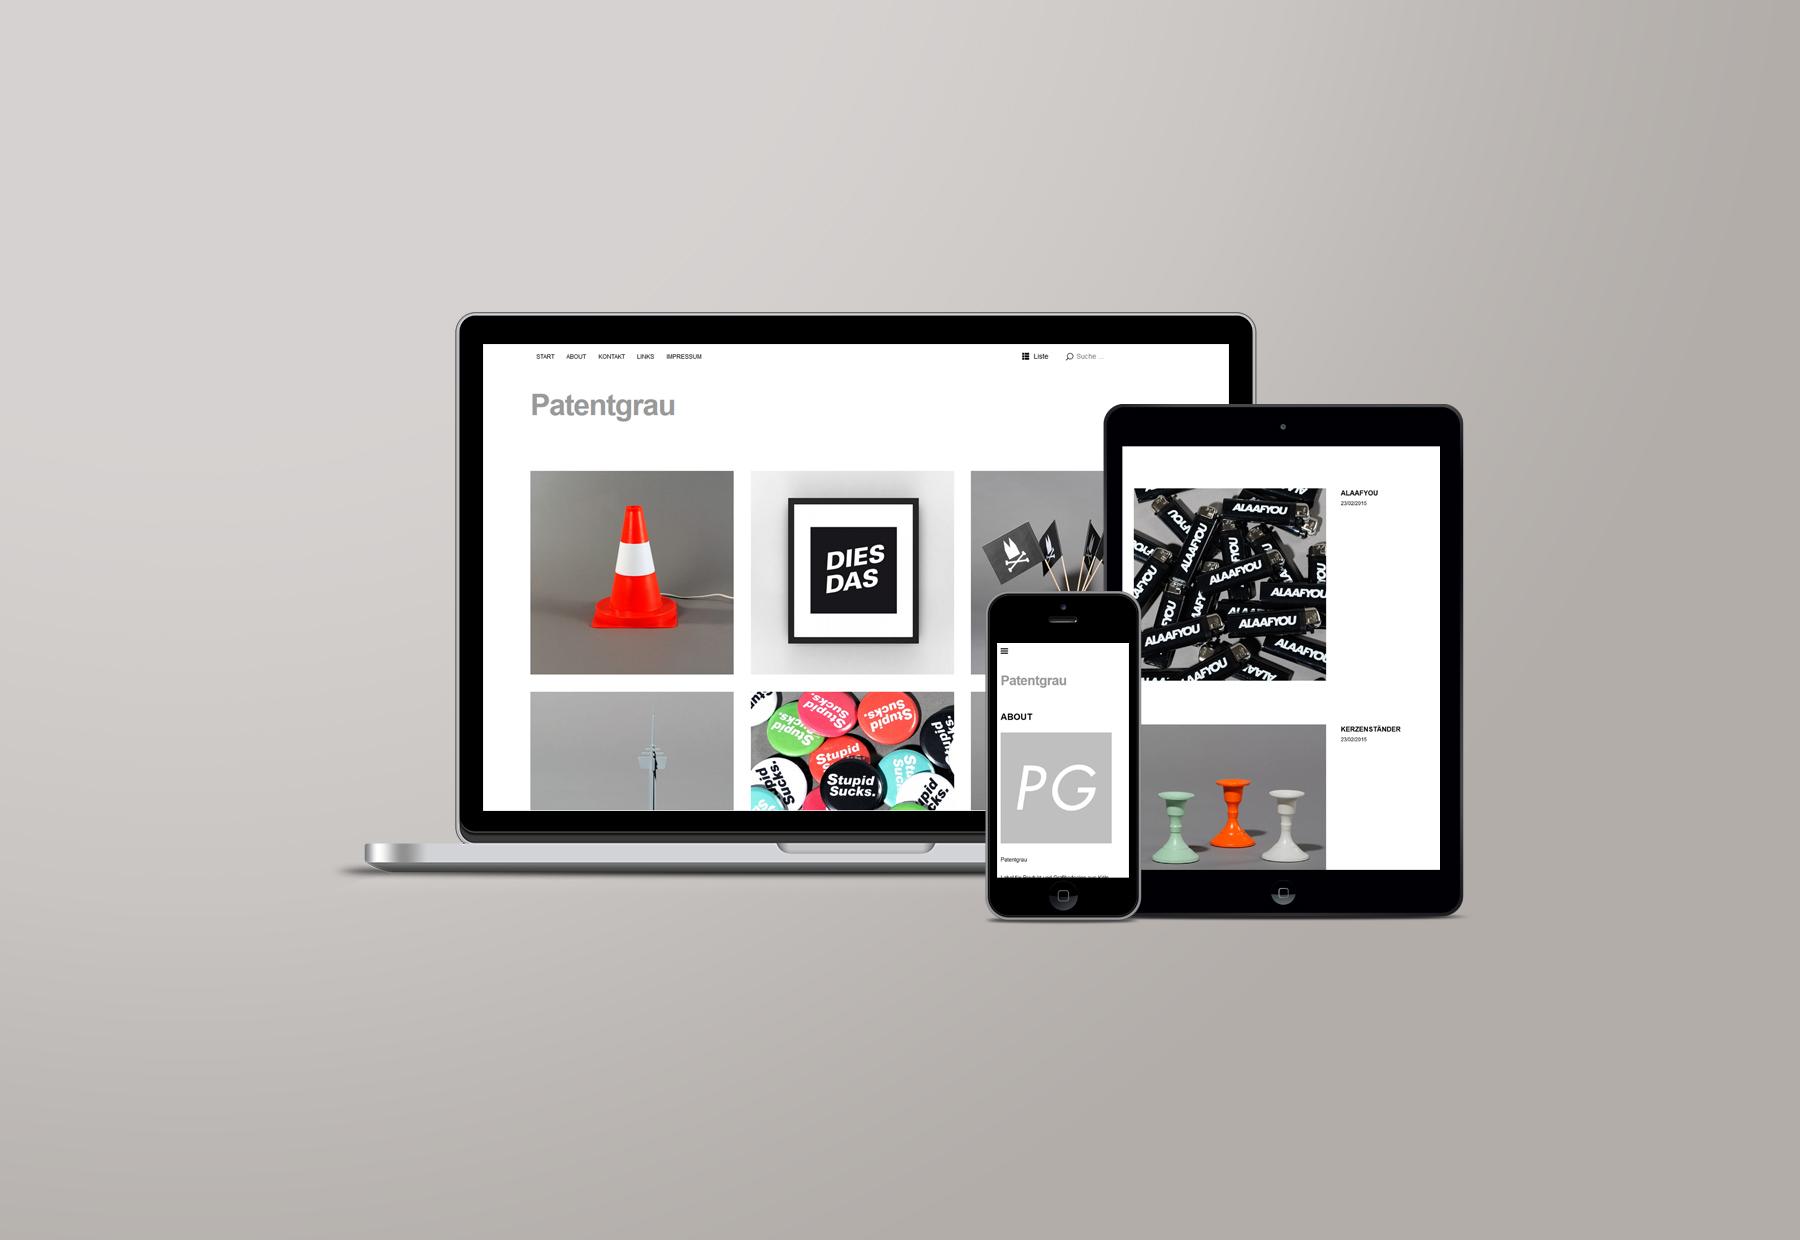 emanuel_steffens_patentgrau_site